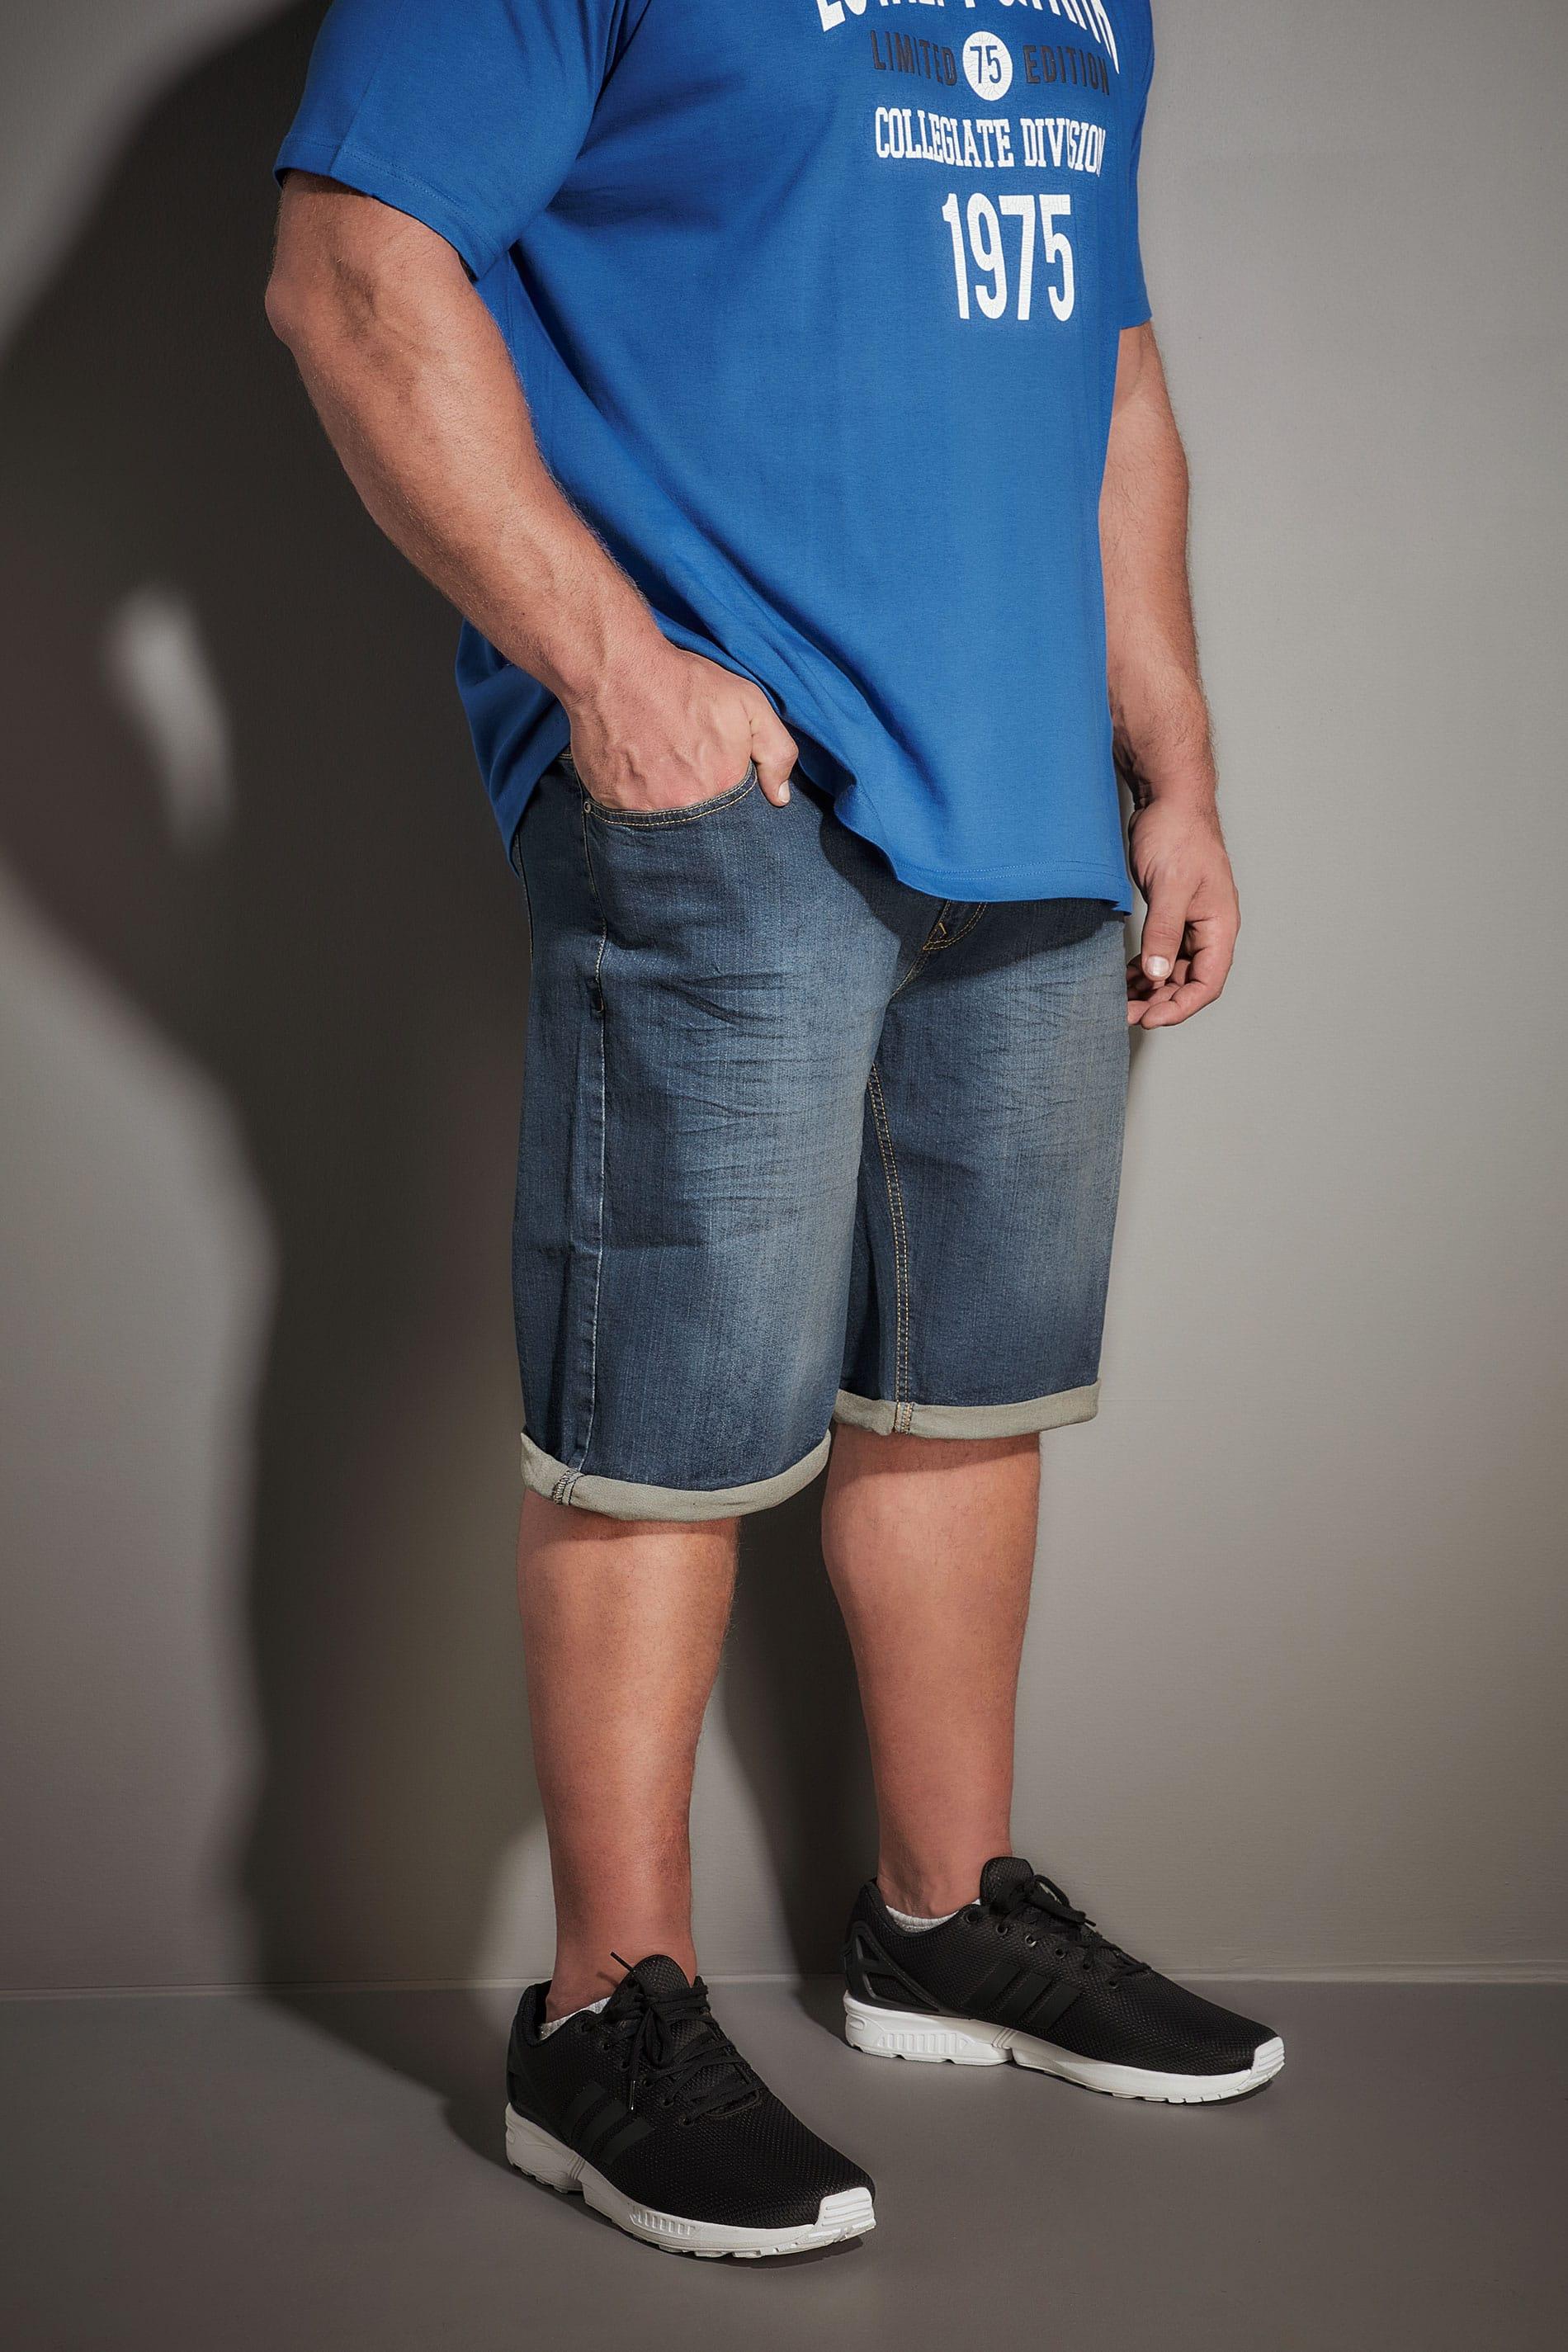 LOYALTY & FAITH Jeans-Shorts gewaschen - Dunkelblau